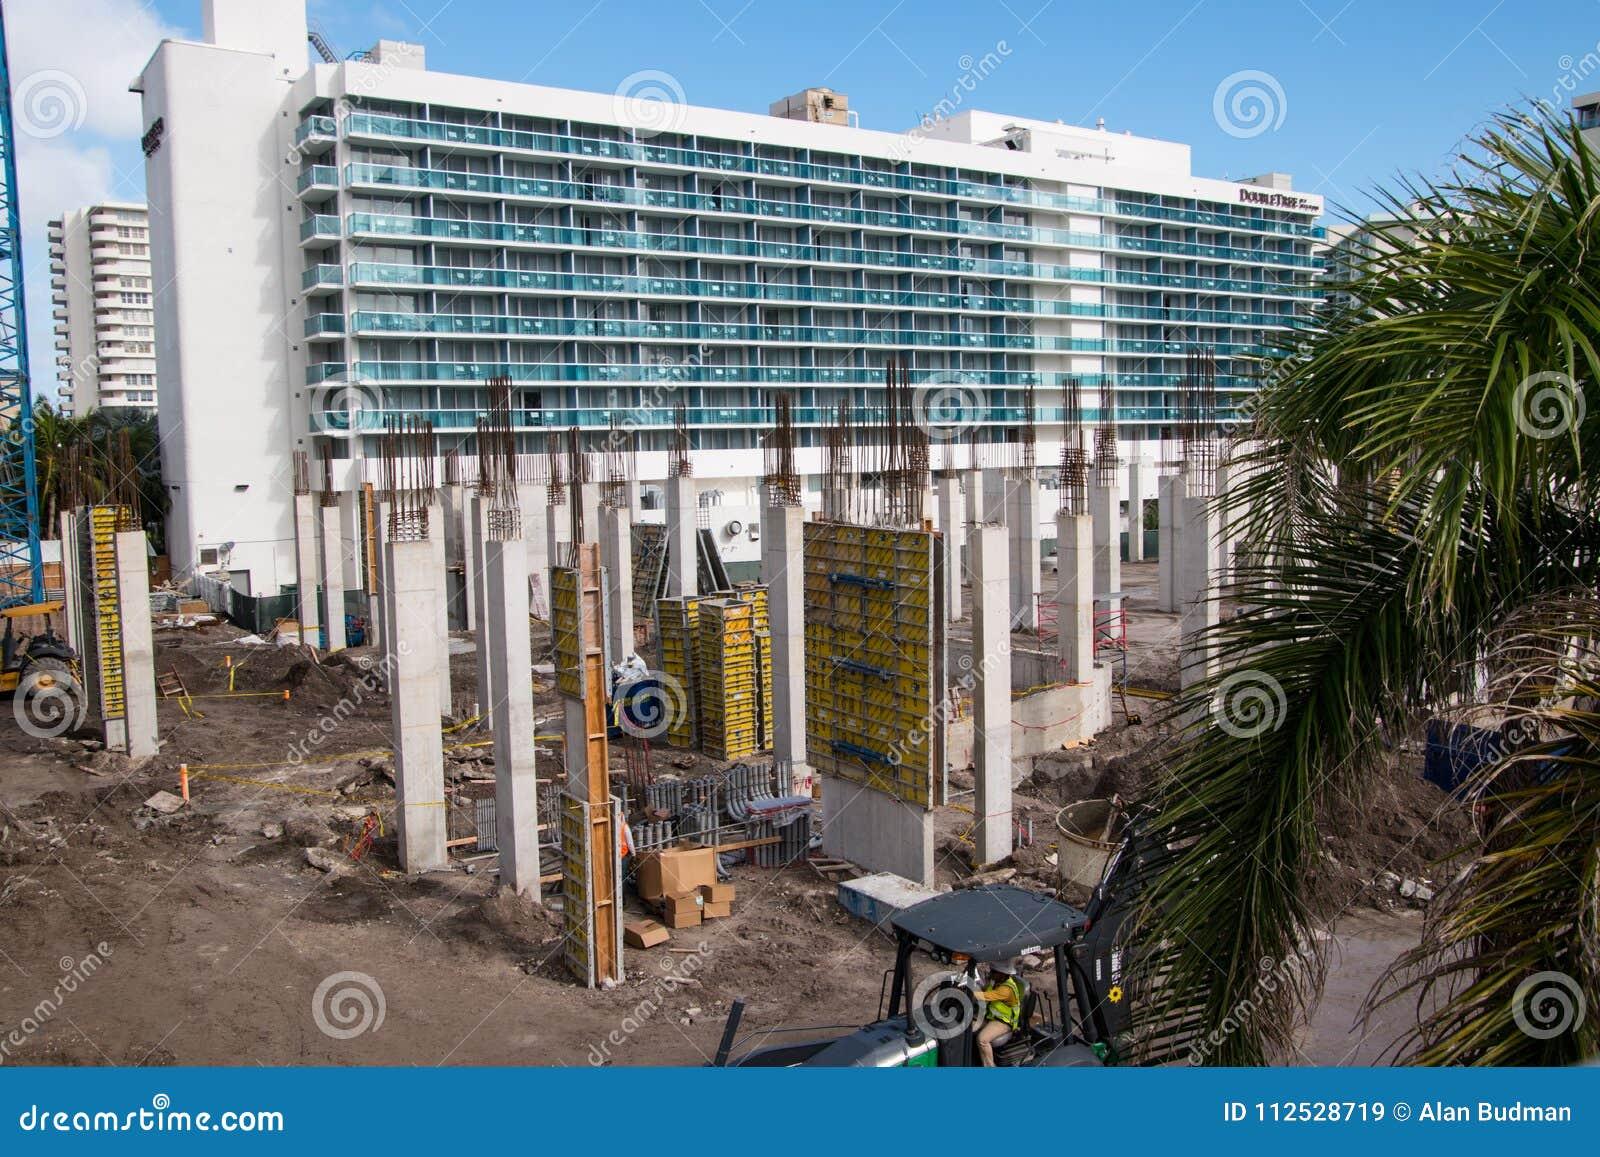 Baustelle in Hallandale Florida